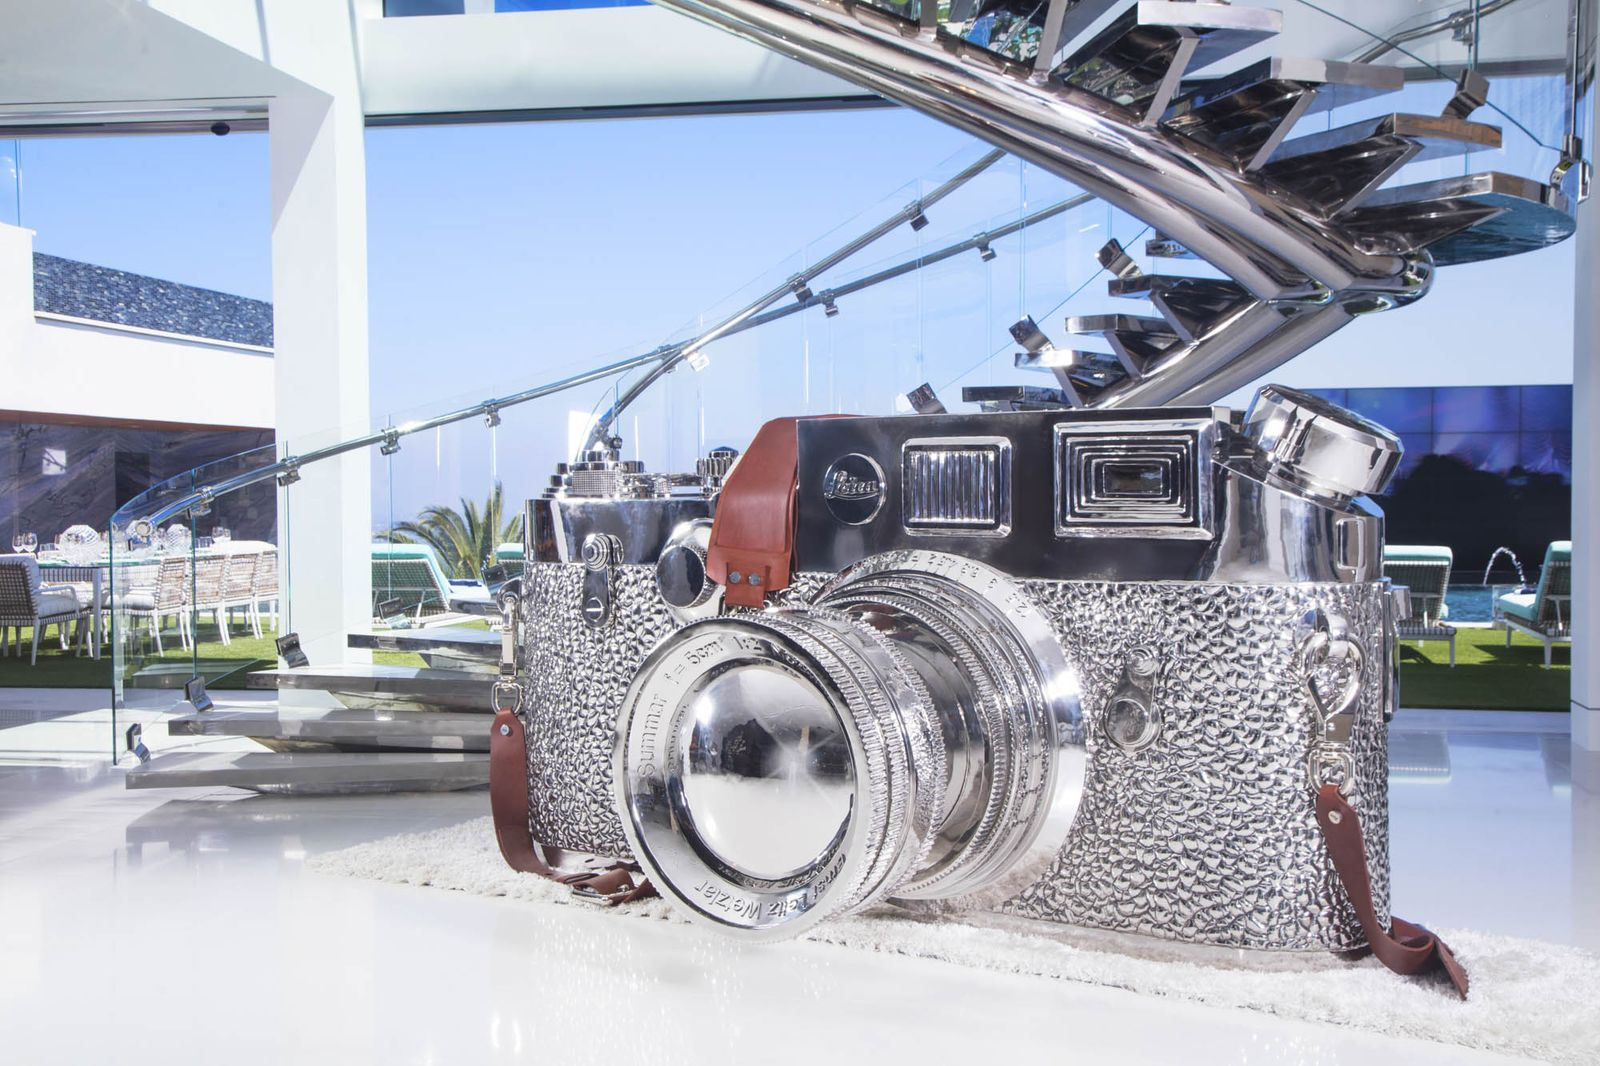 Bruce Makowsky Leica Camera